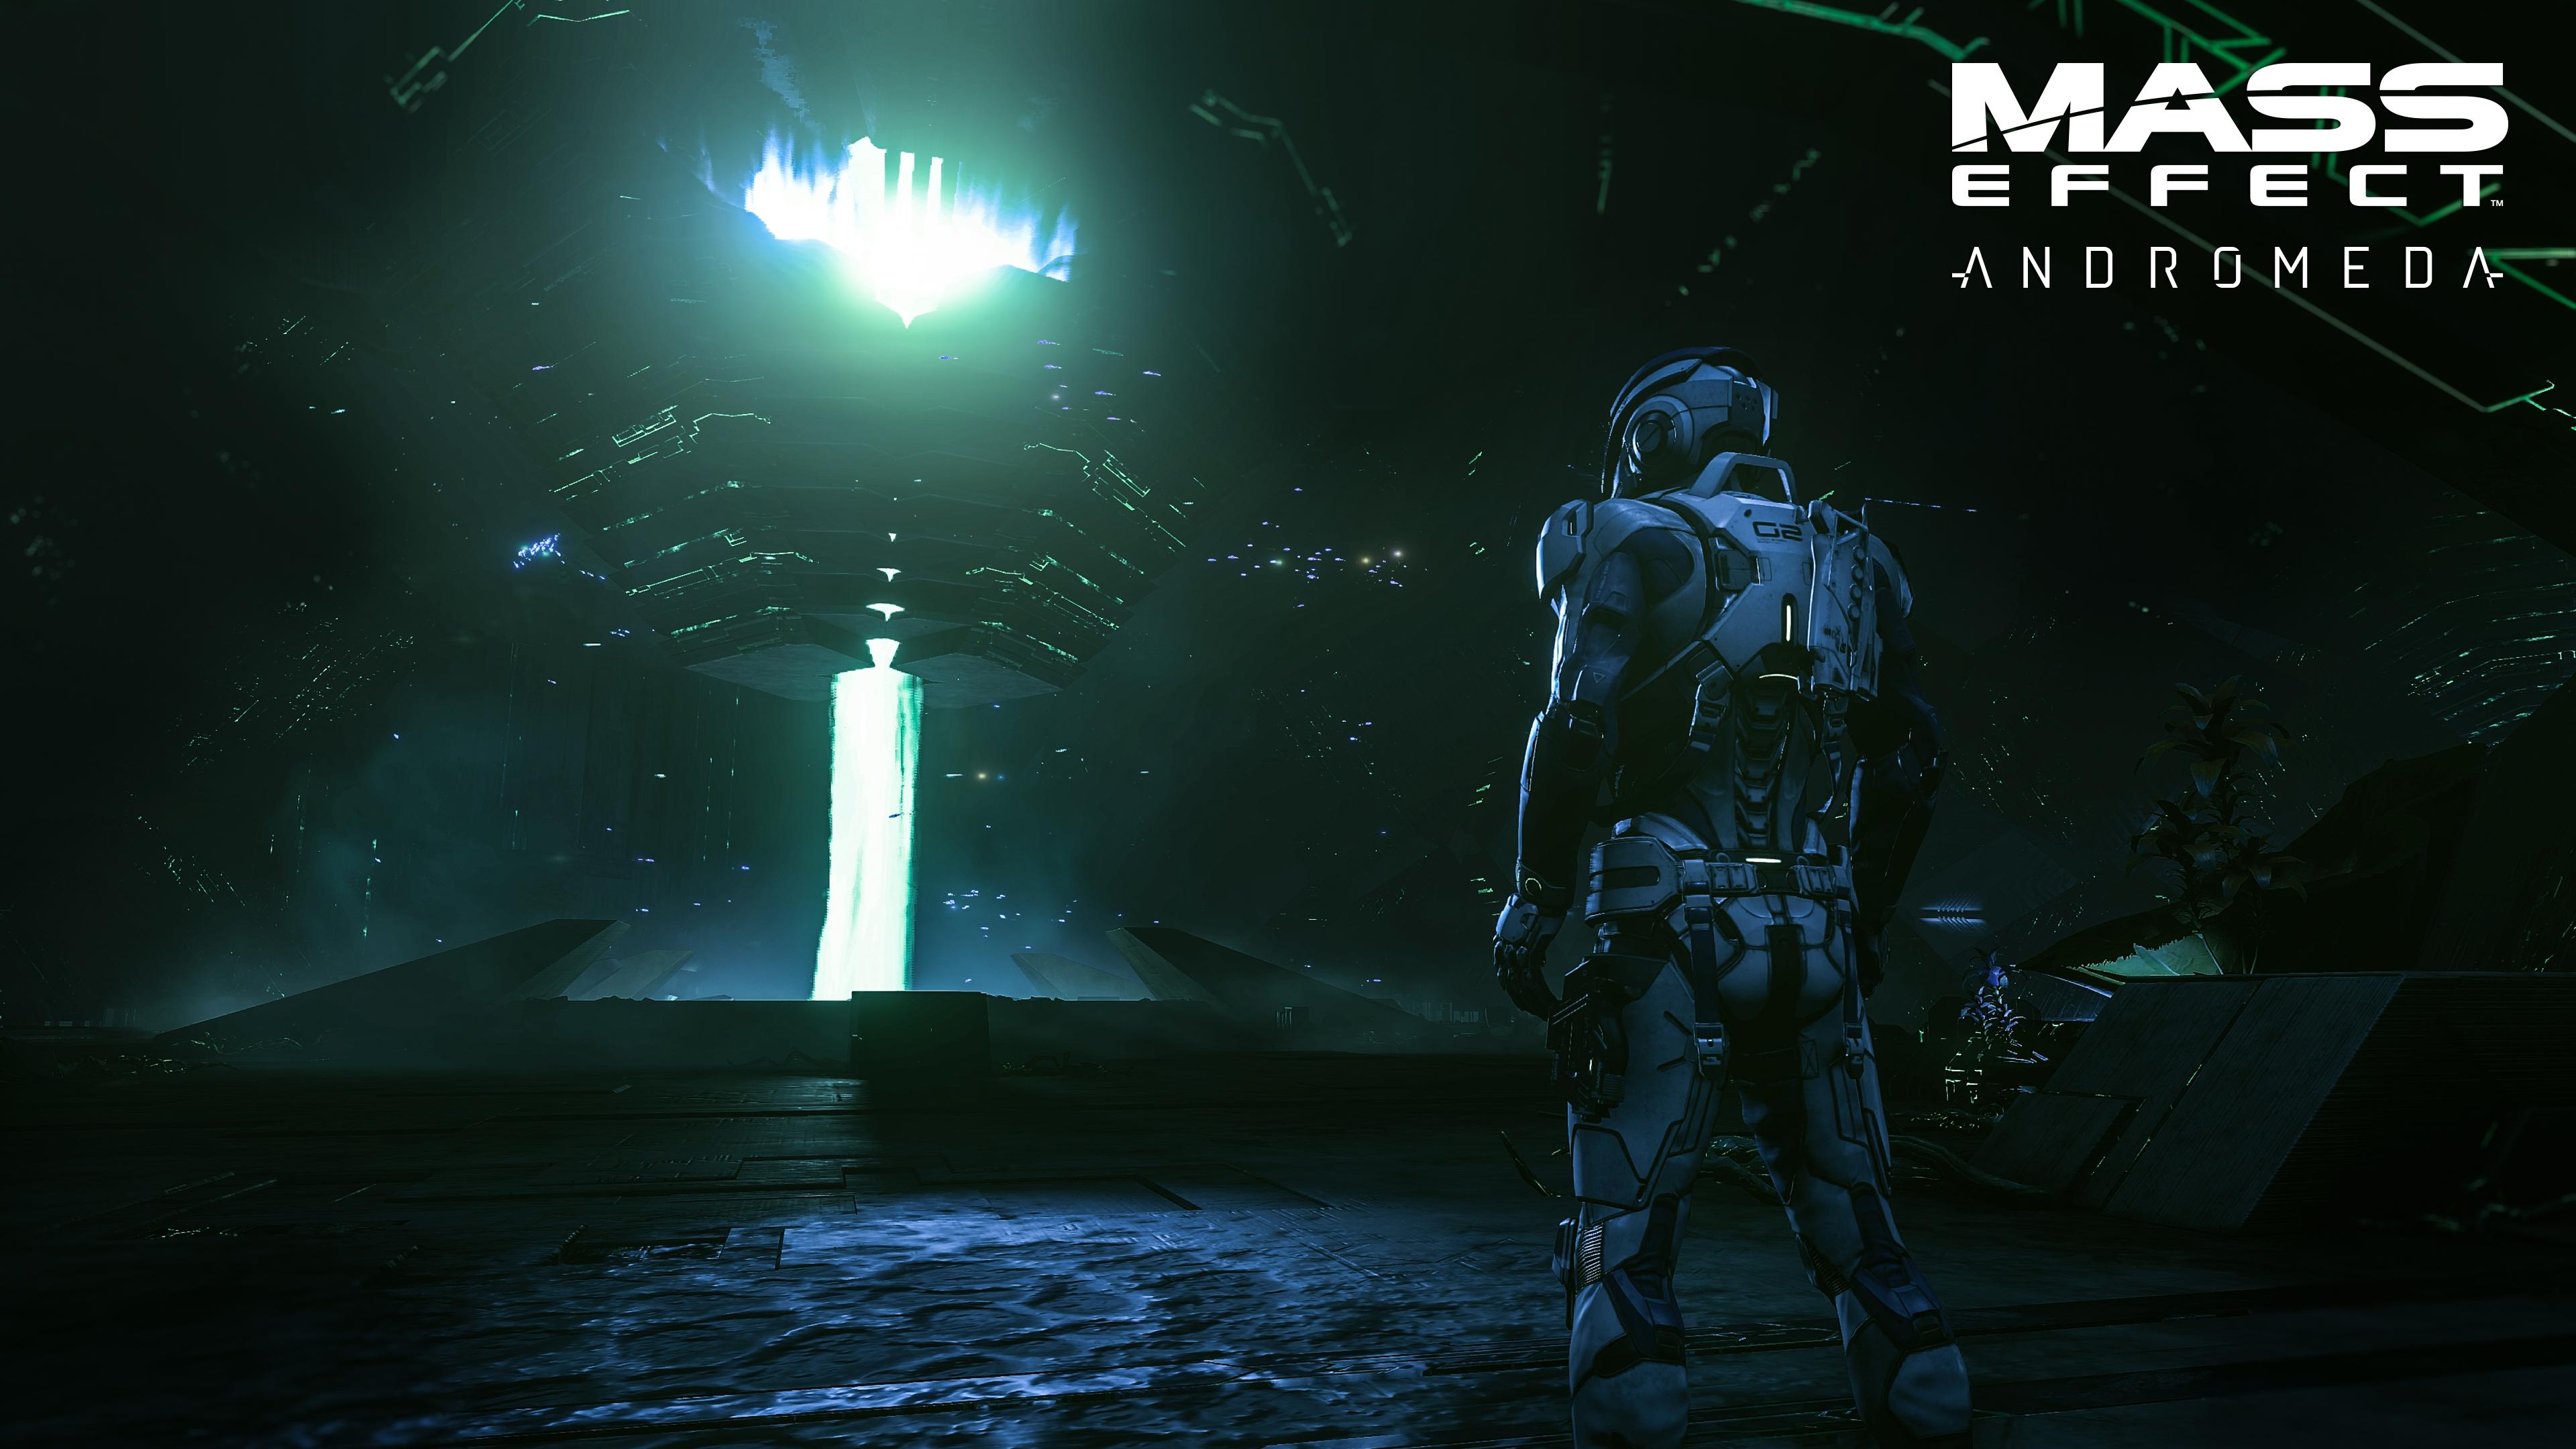 Mass Effect – Andromeda un incroyable teaser en 4K!